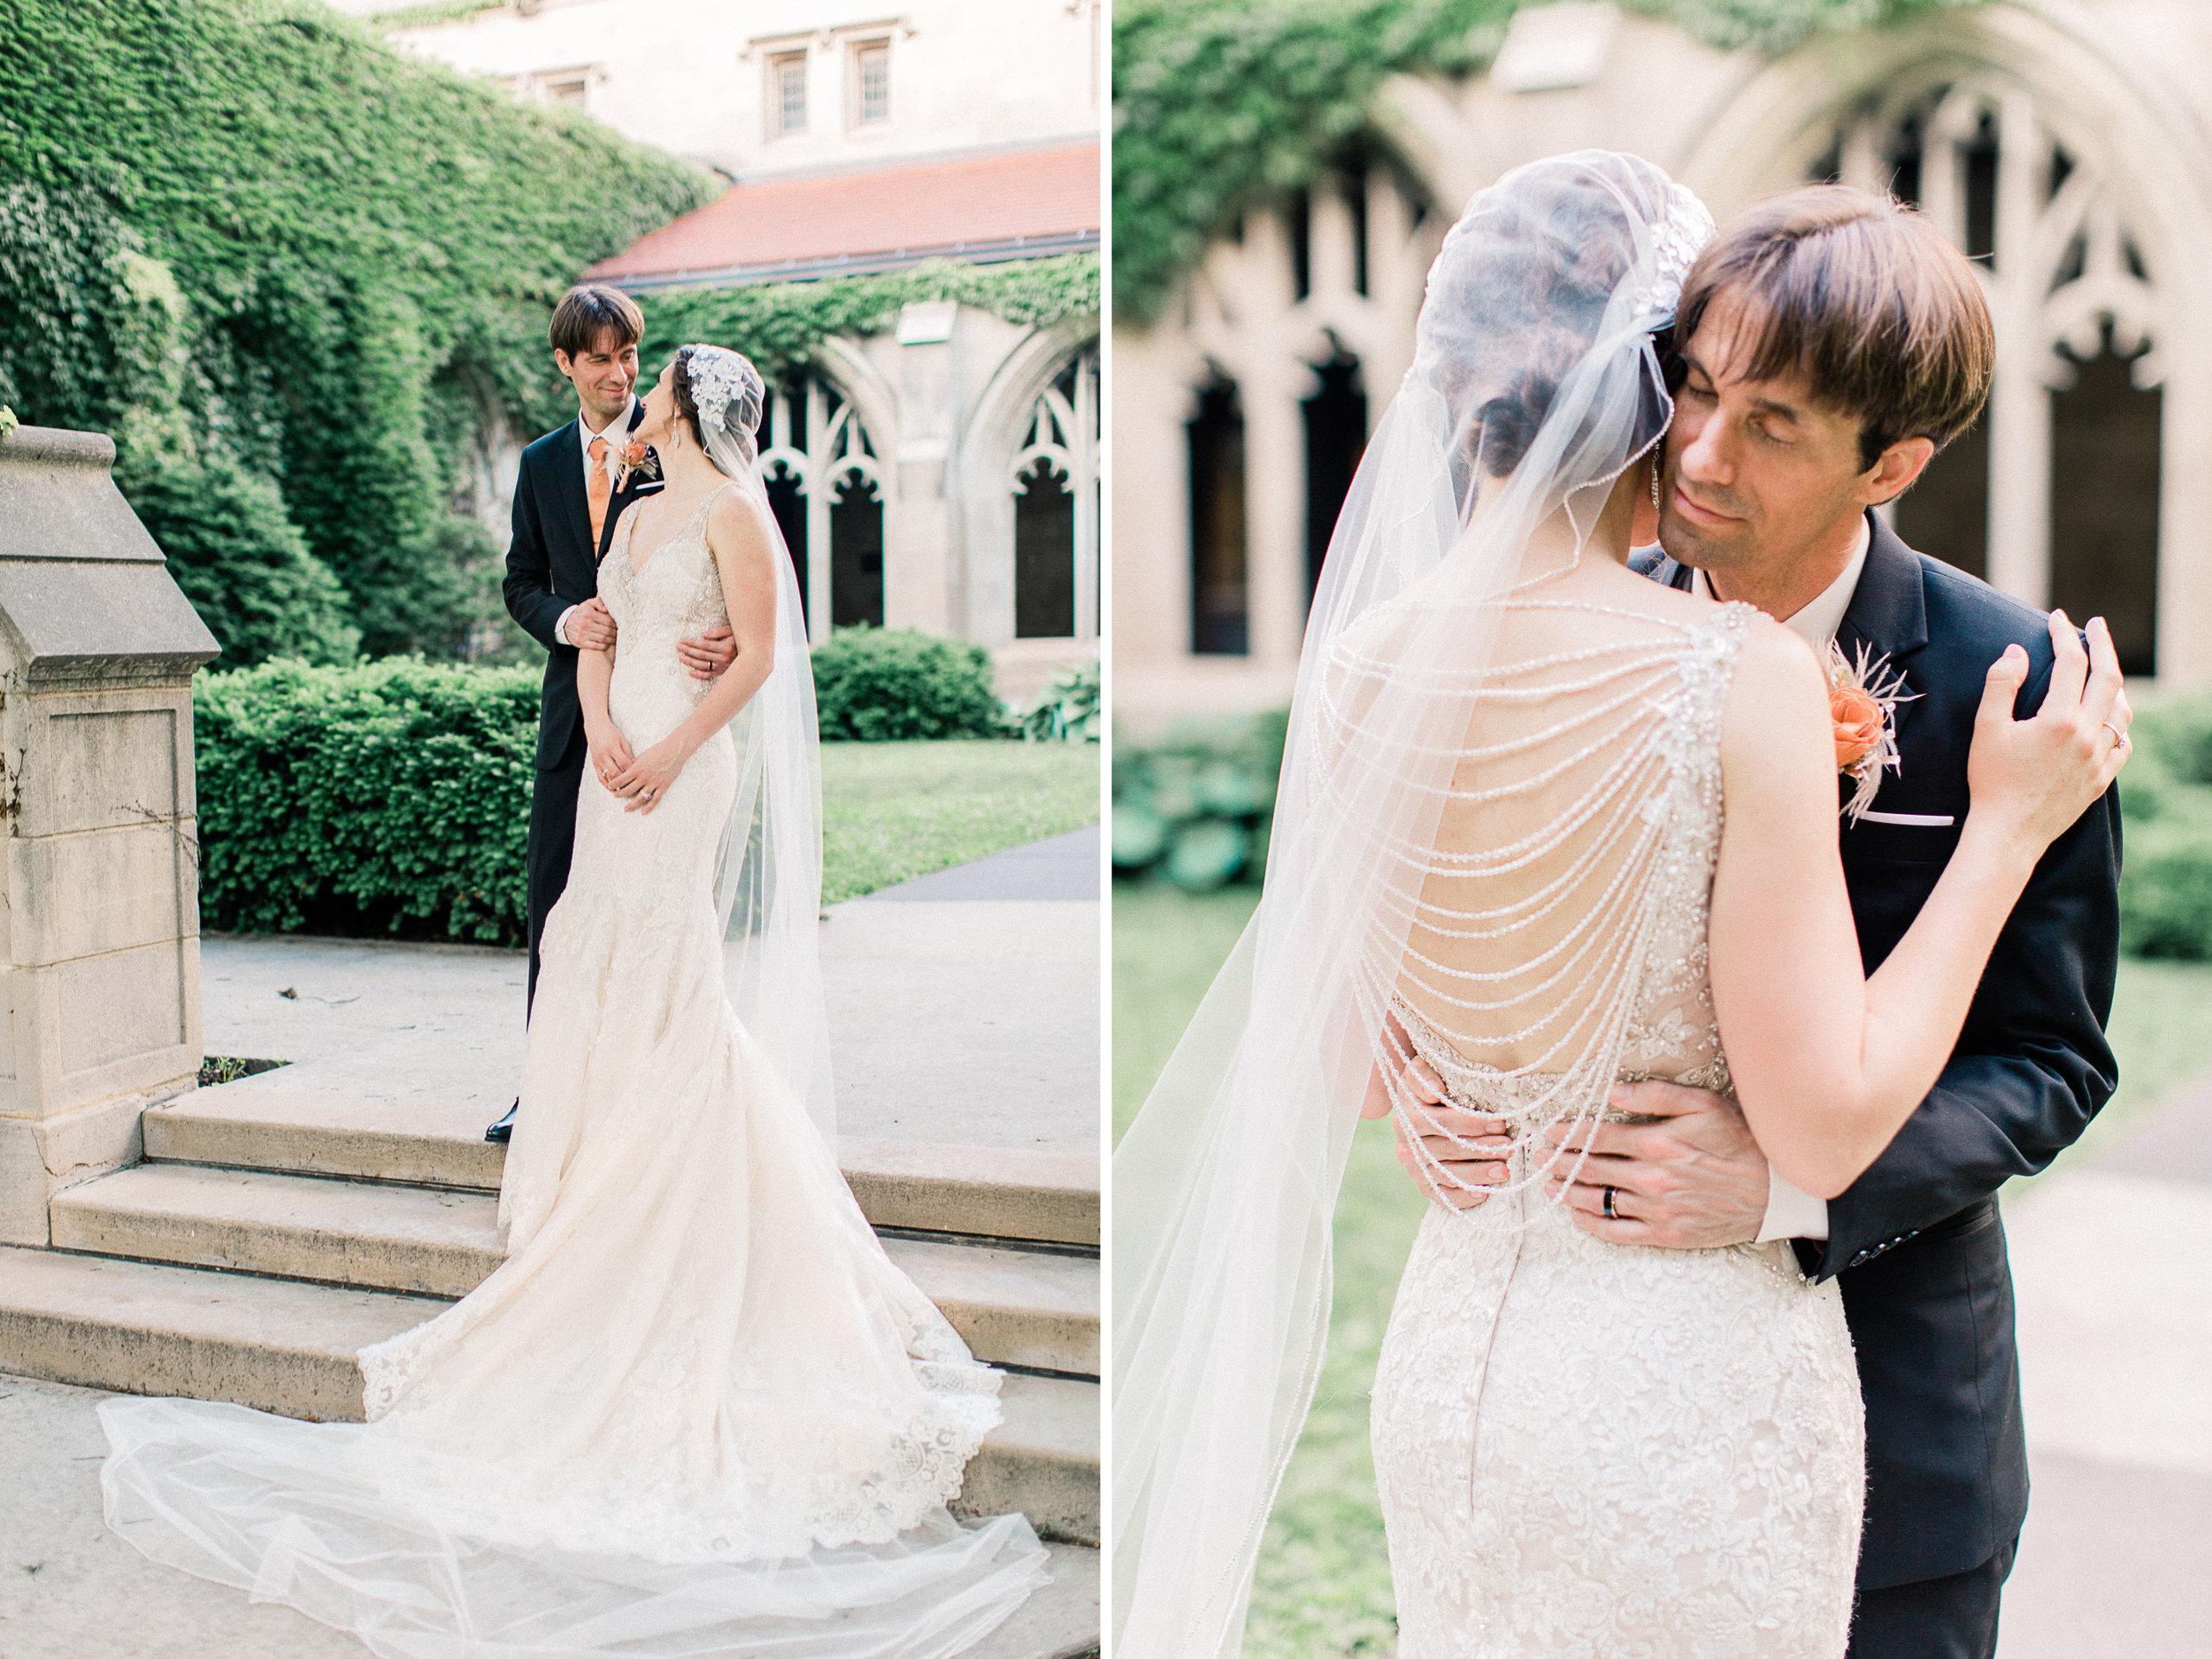 Dorothy_Louise_Photography_University_of_Chicago_Wedding10.jpg